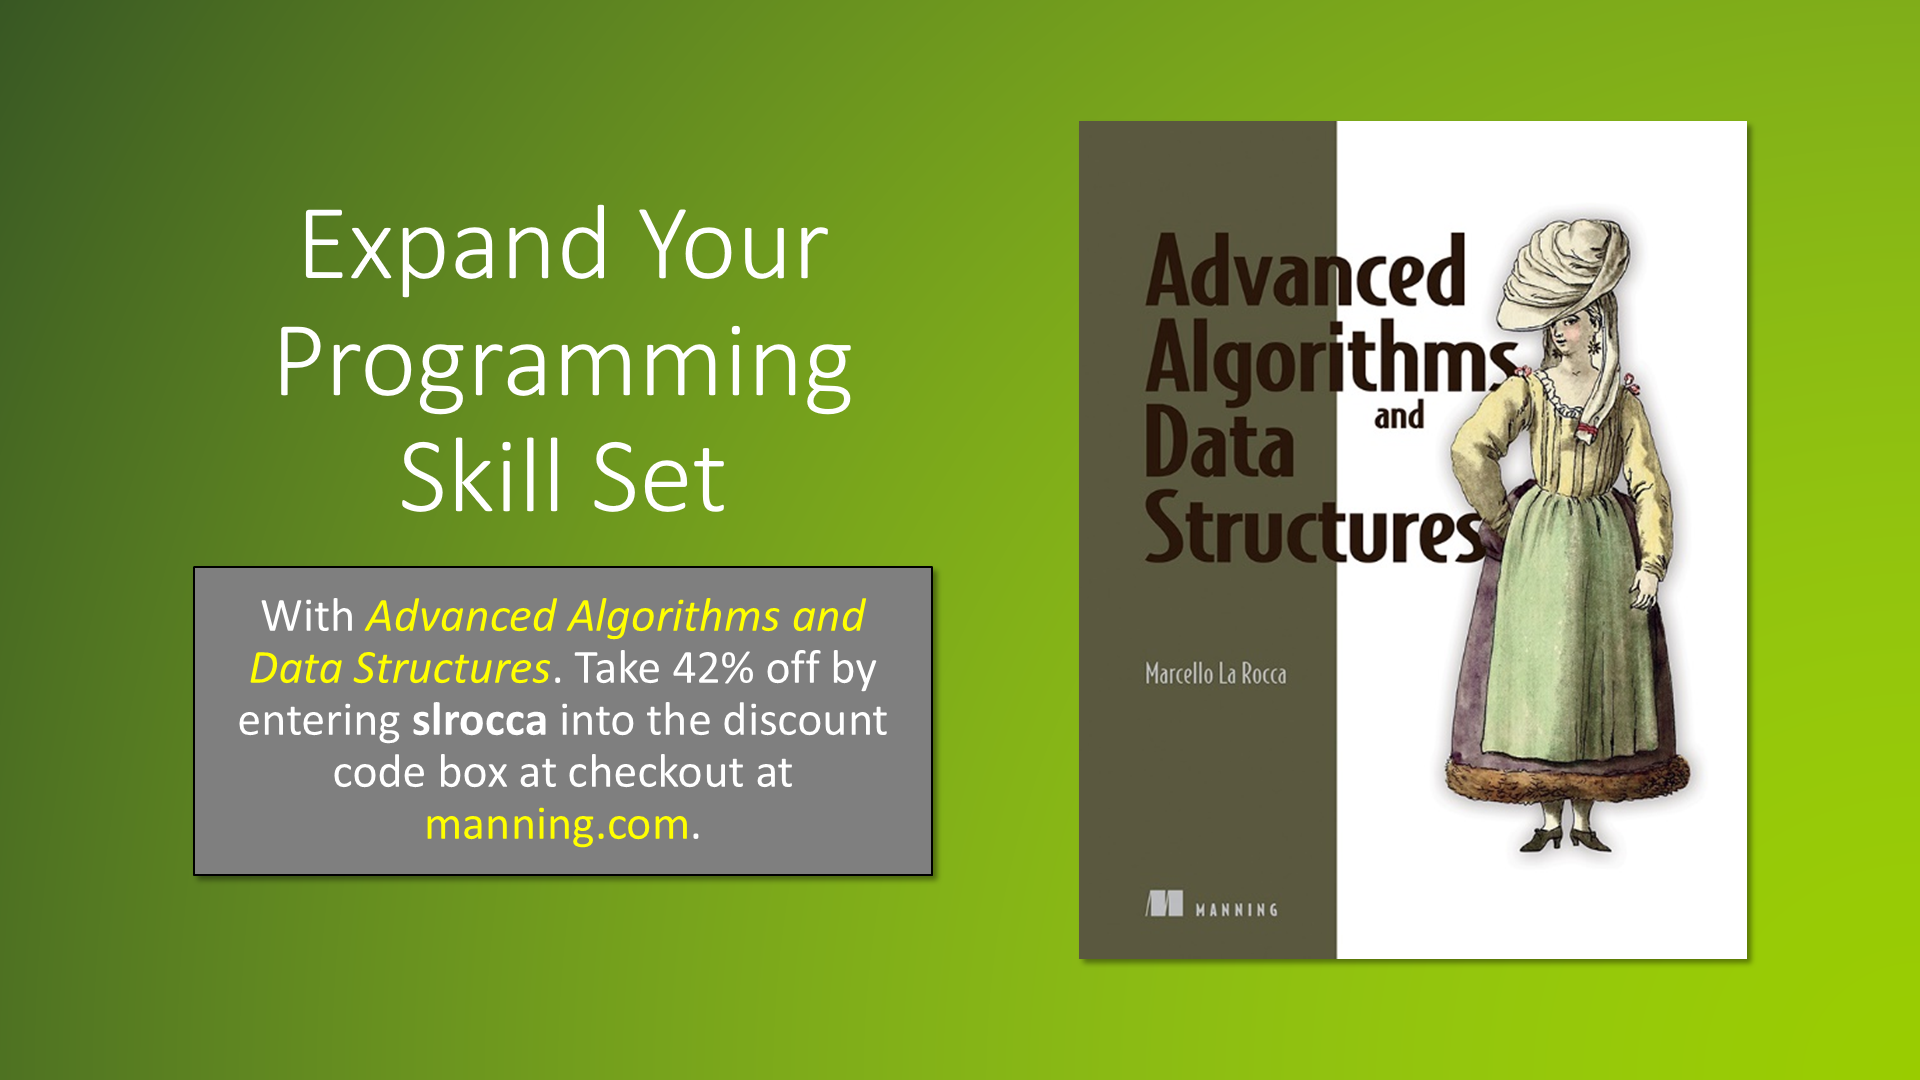 slideshare-expand-your-programming-skill-set